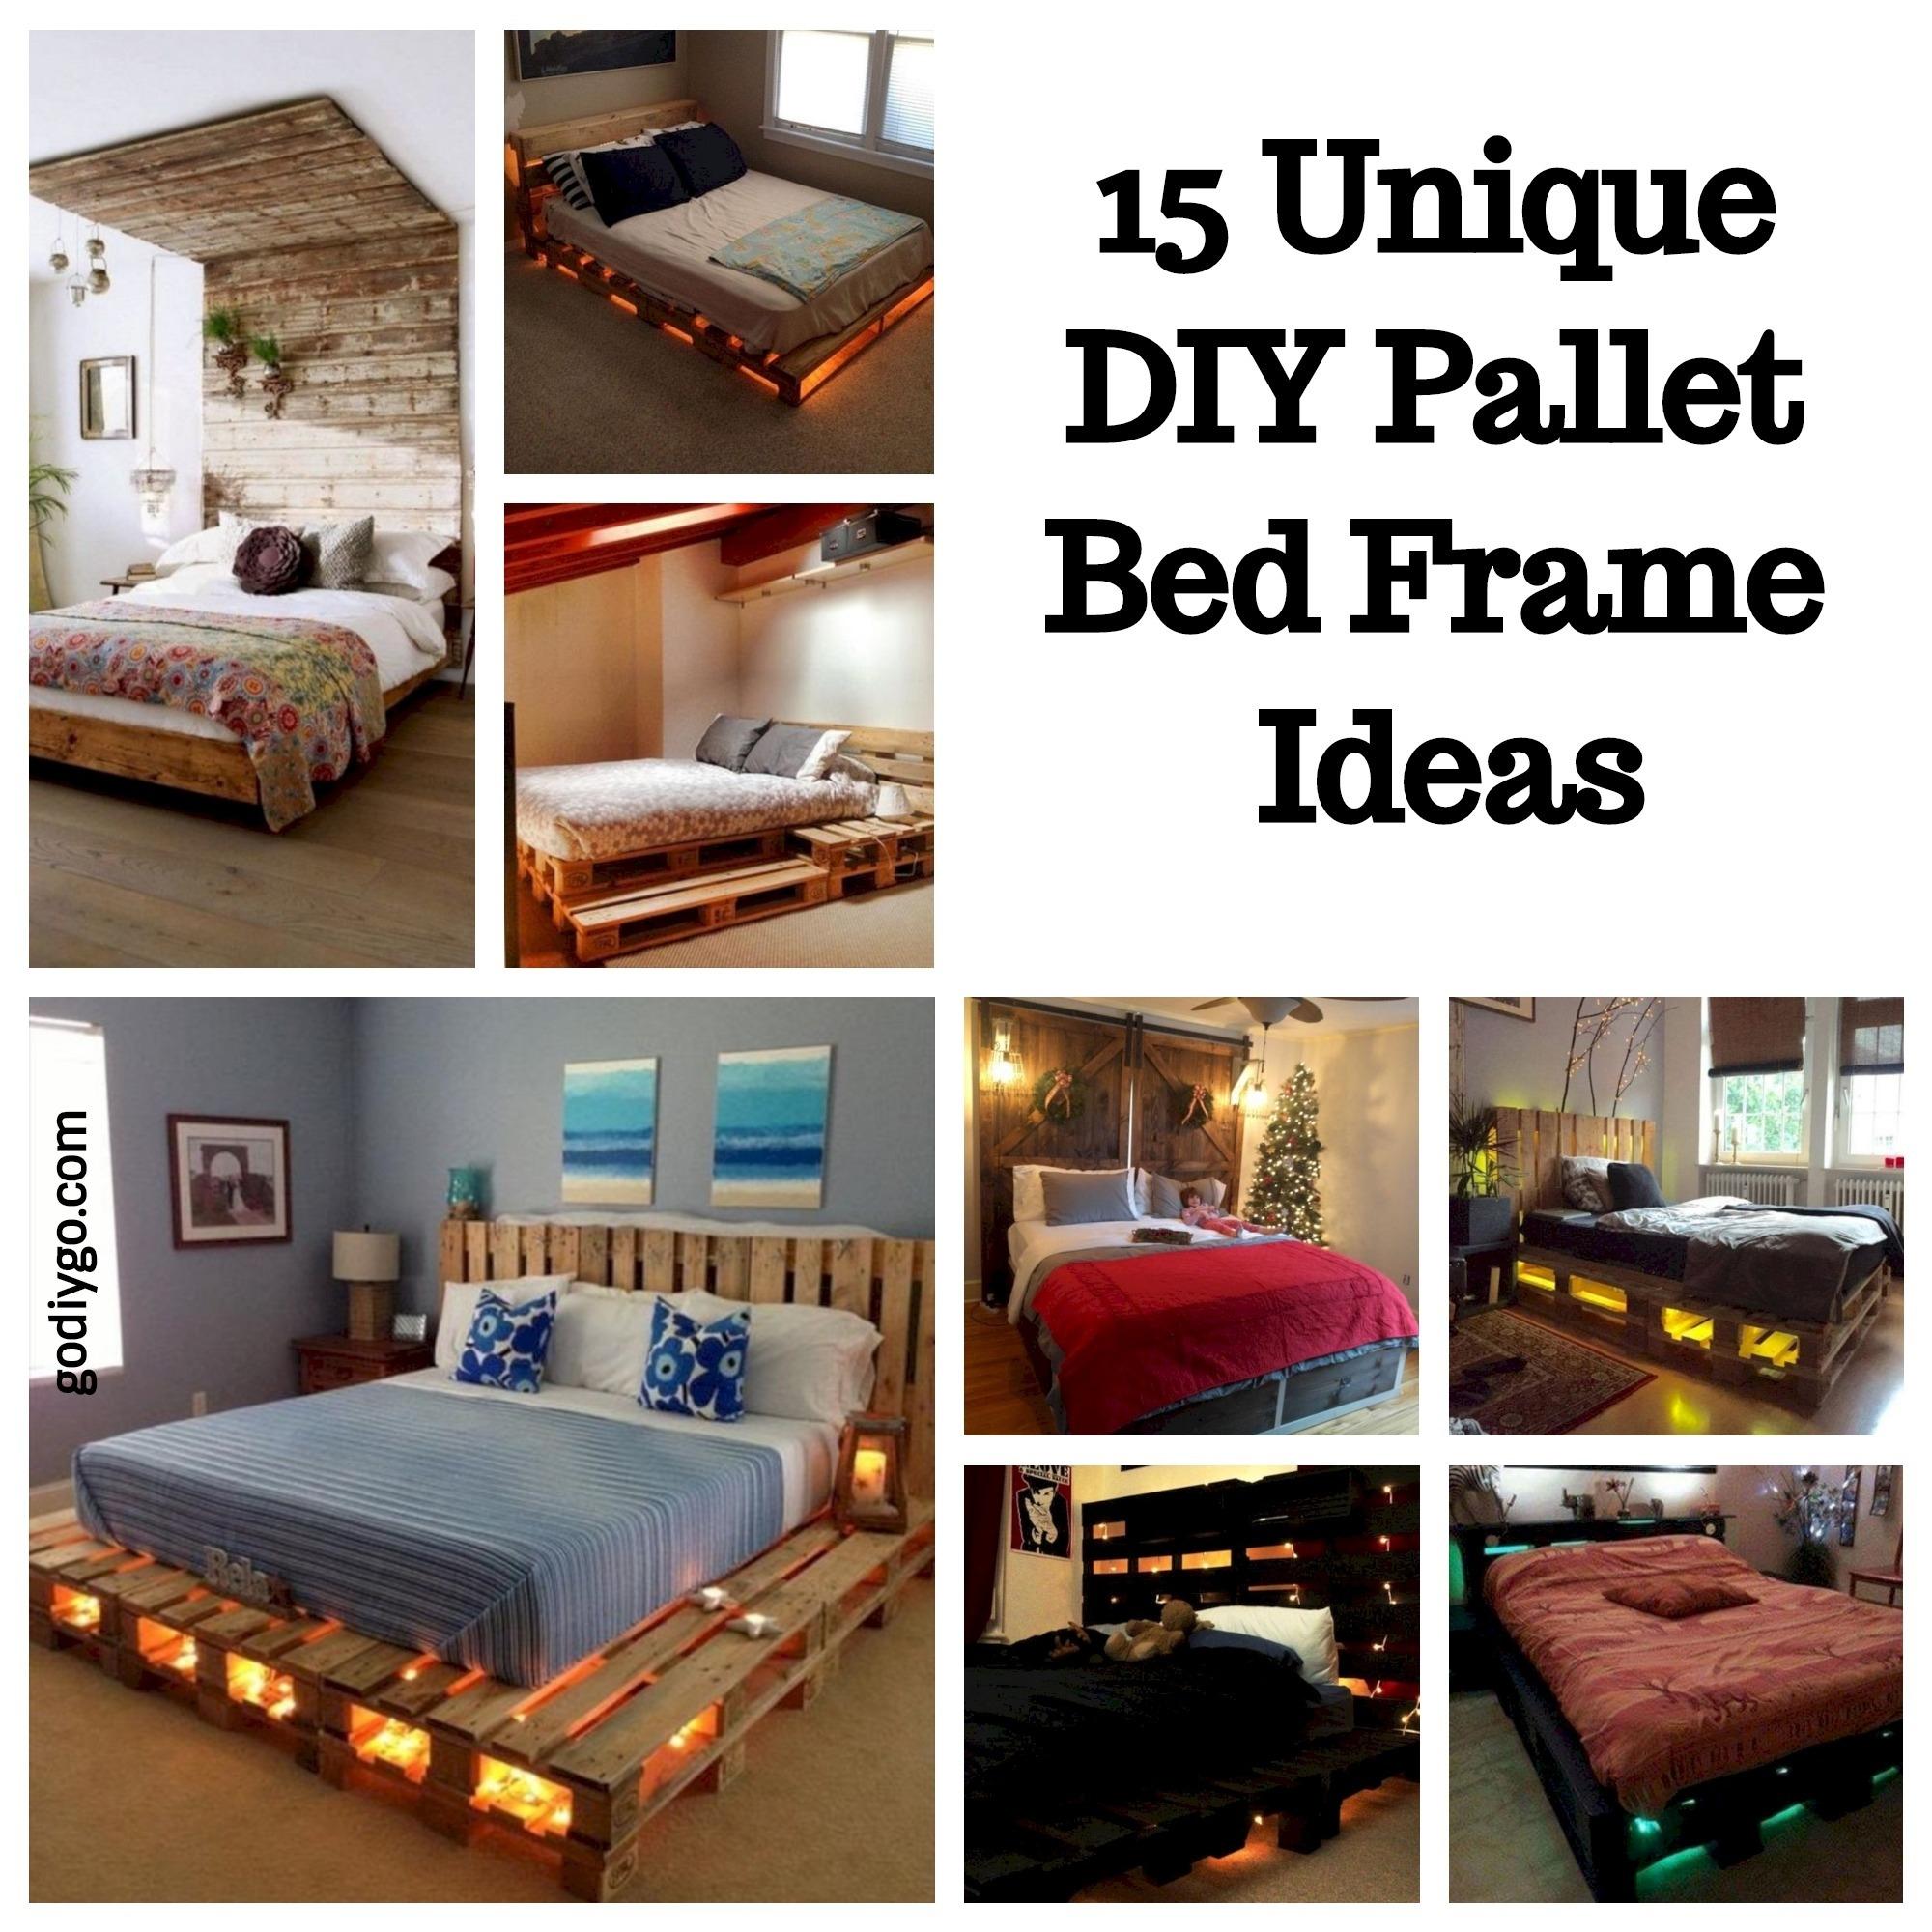 15 Unique DIY Pallet Bed Frame Ideas - GODIYGO.COM on Bedroom Pallet Ideas  id=78356